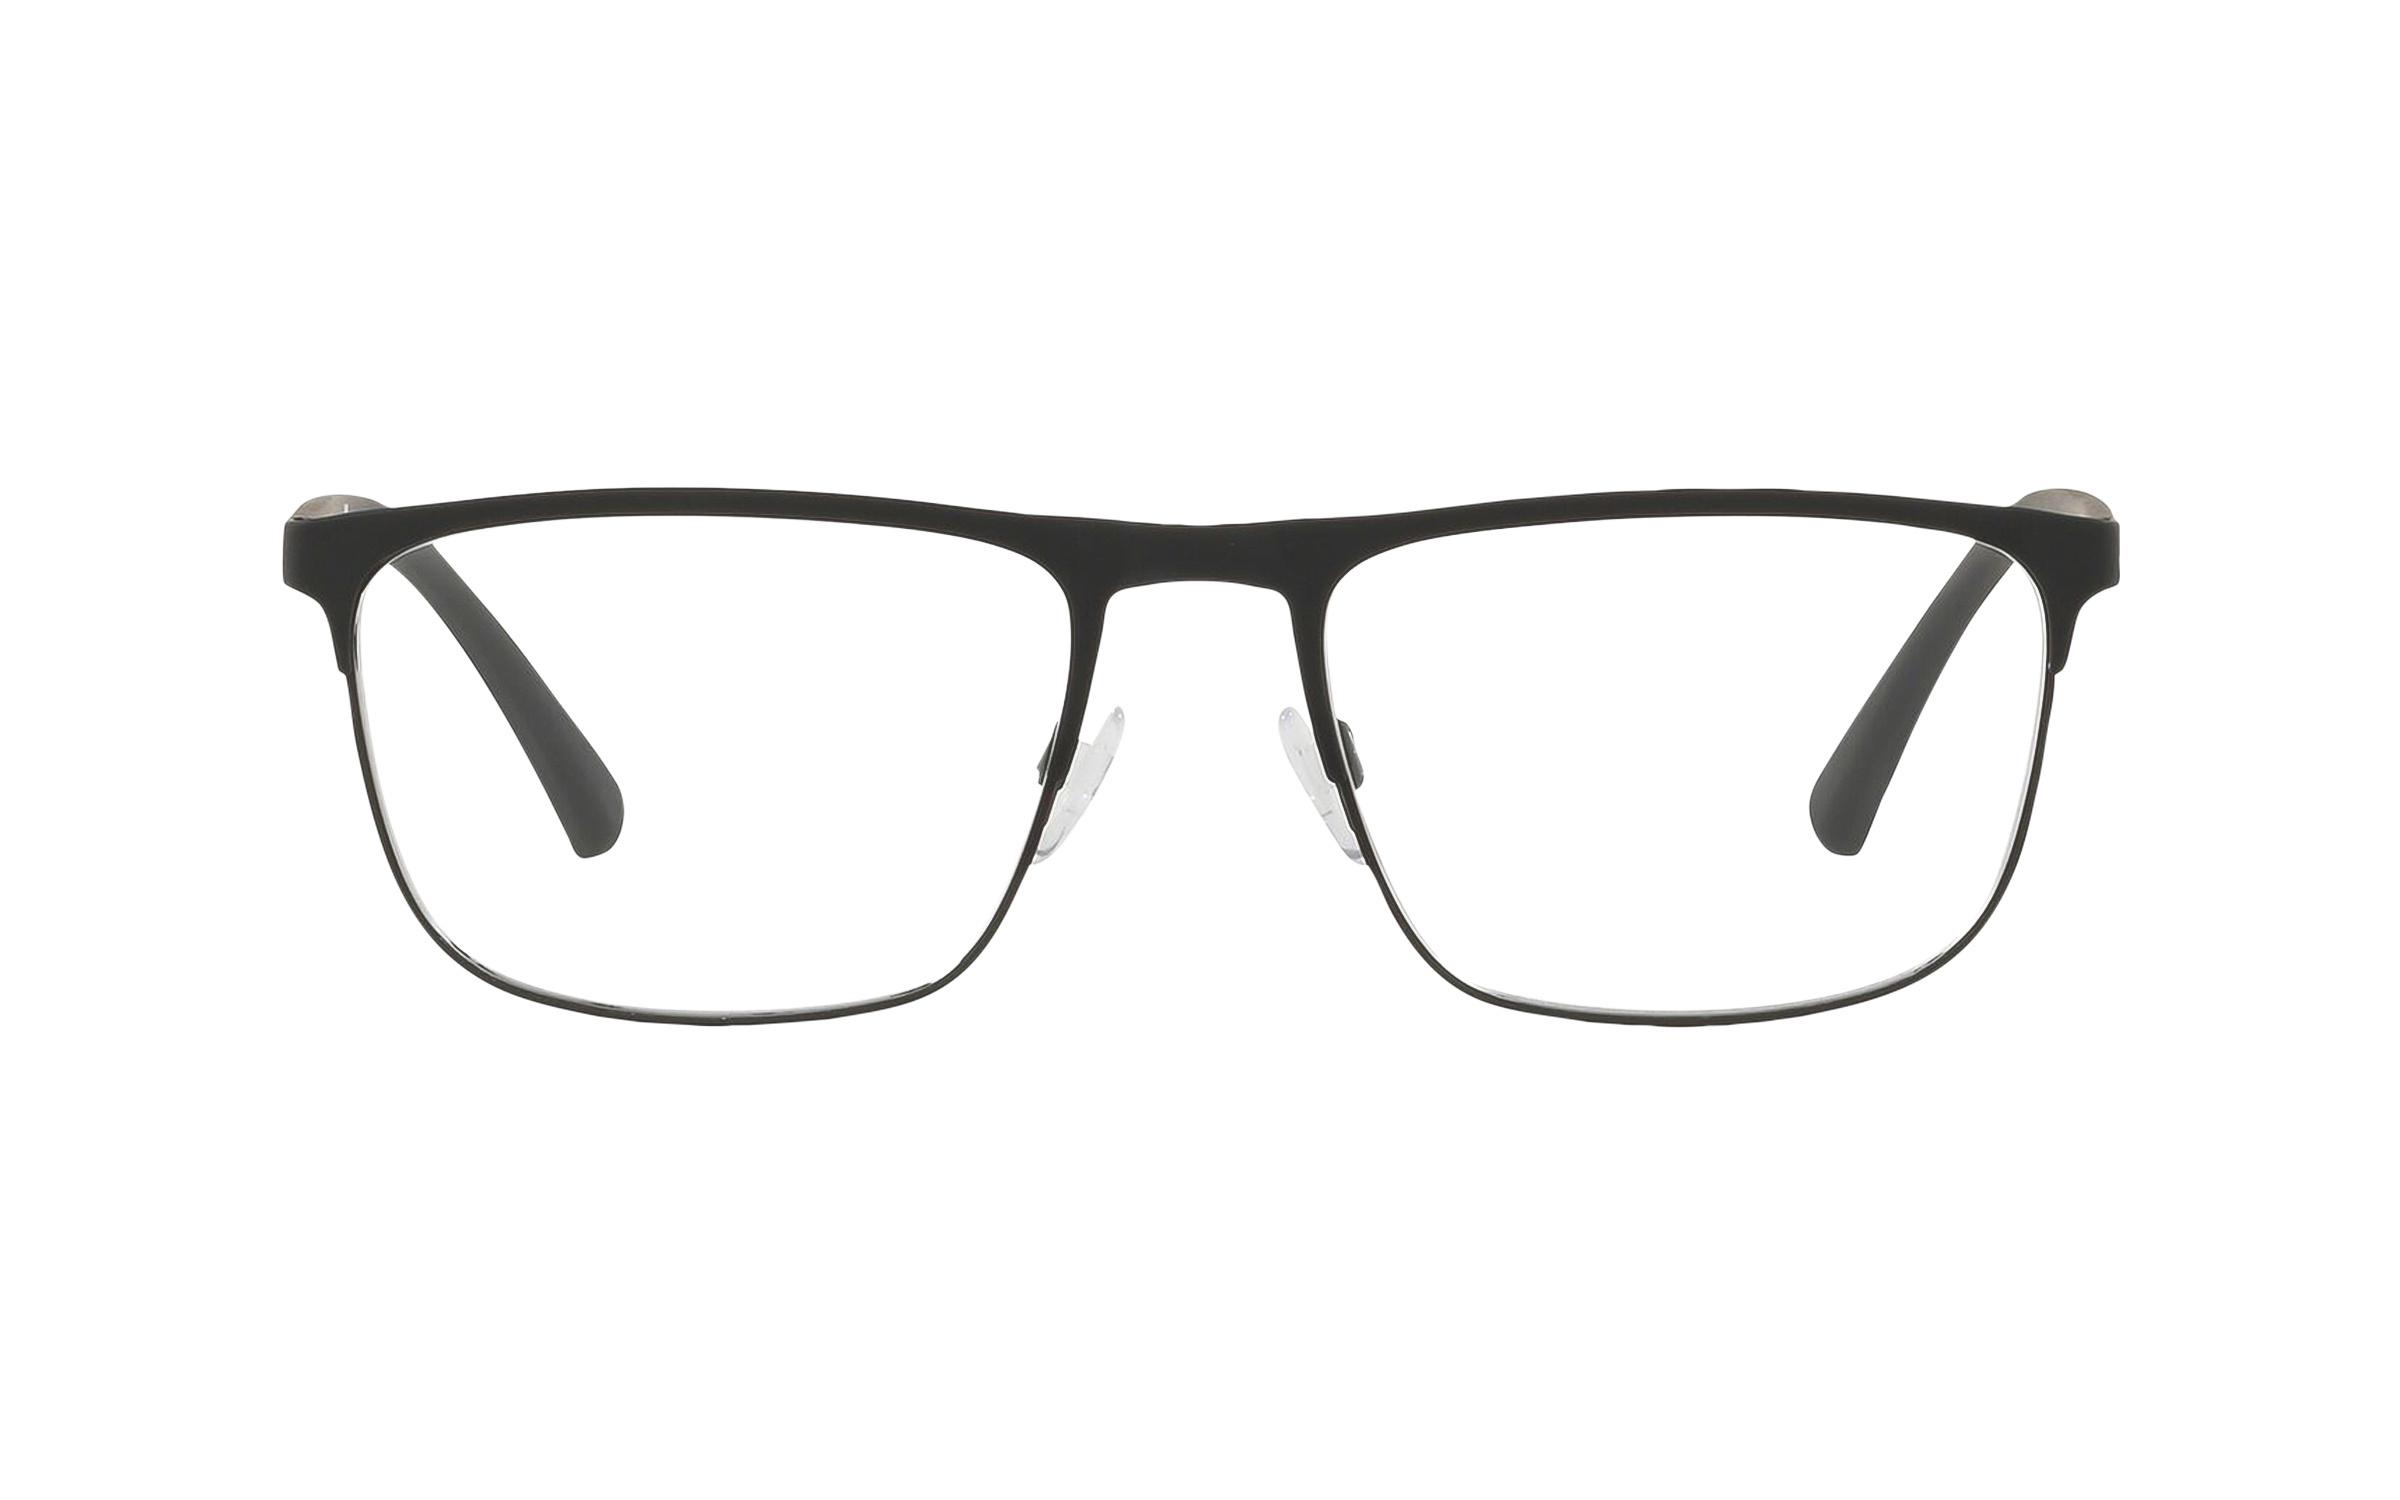 Luxottica Emporio Armani EA1079 3094 (55) Eyeglasses and Frame in Rubber Black | Plastic/Metal - Online Coastal